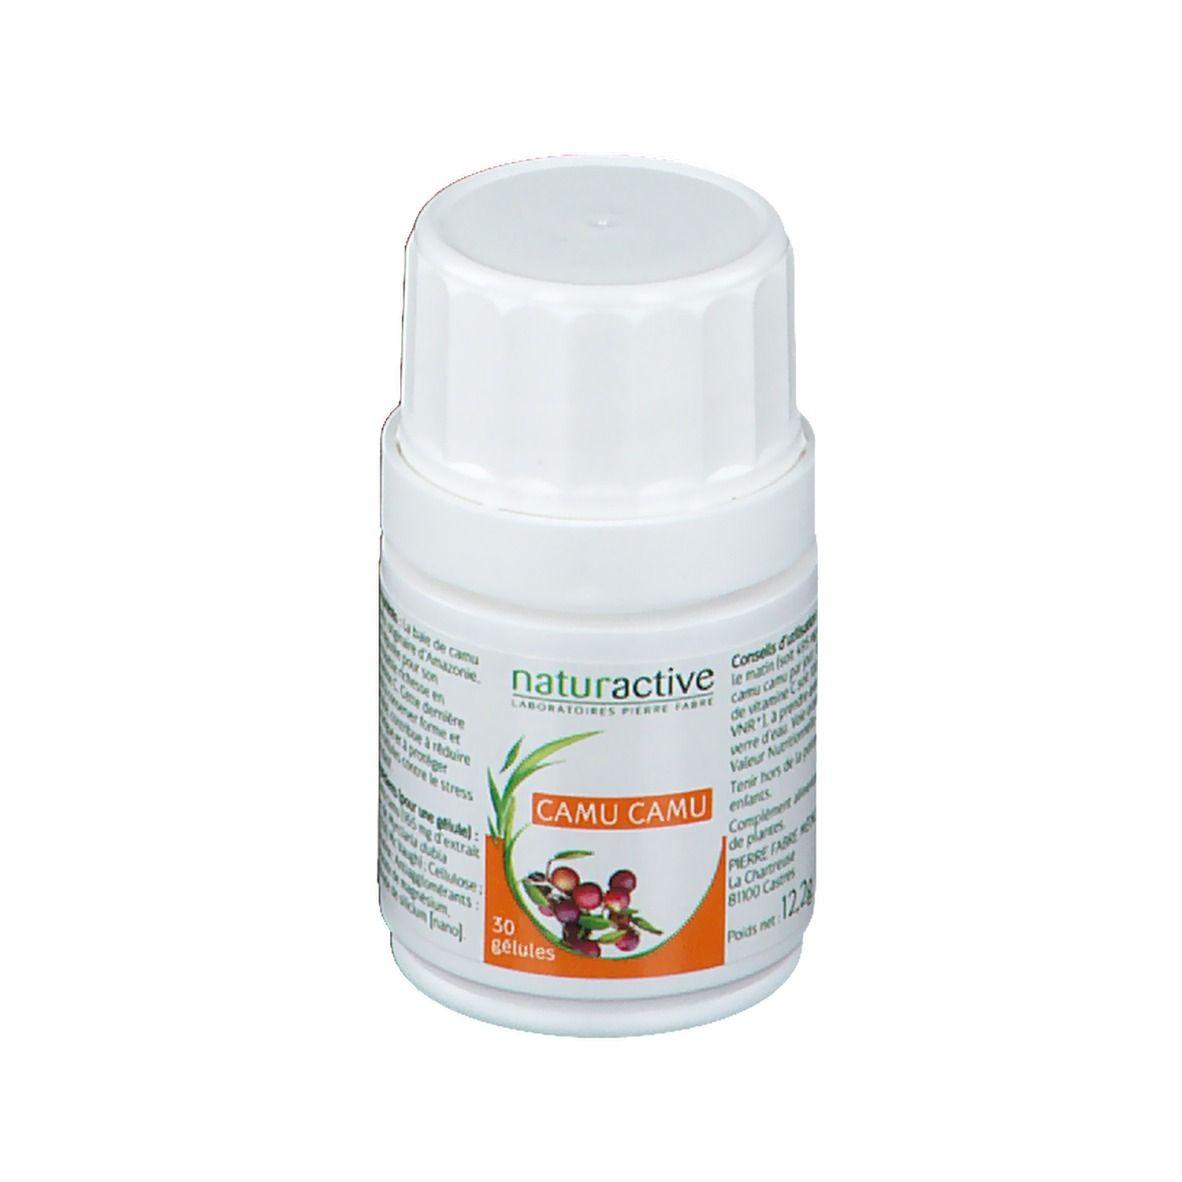 Naturactive Camu Camu pc(s) capsule(s)